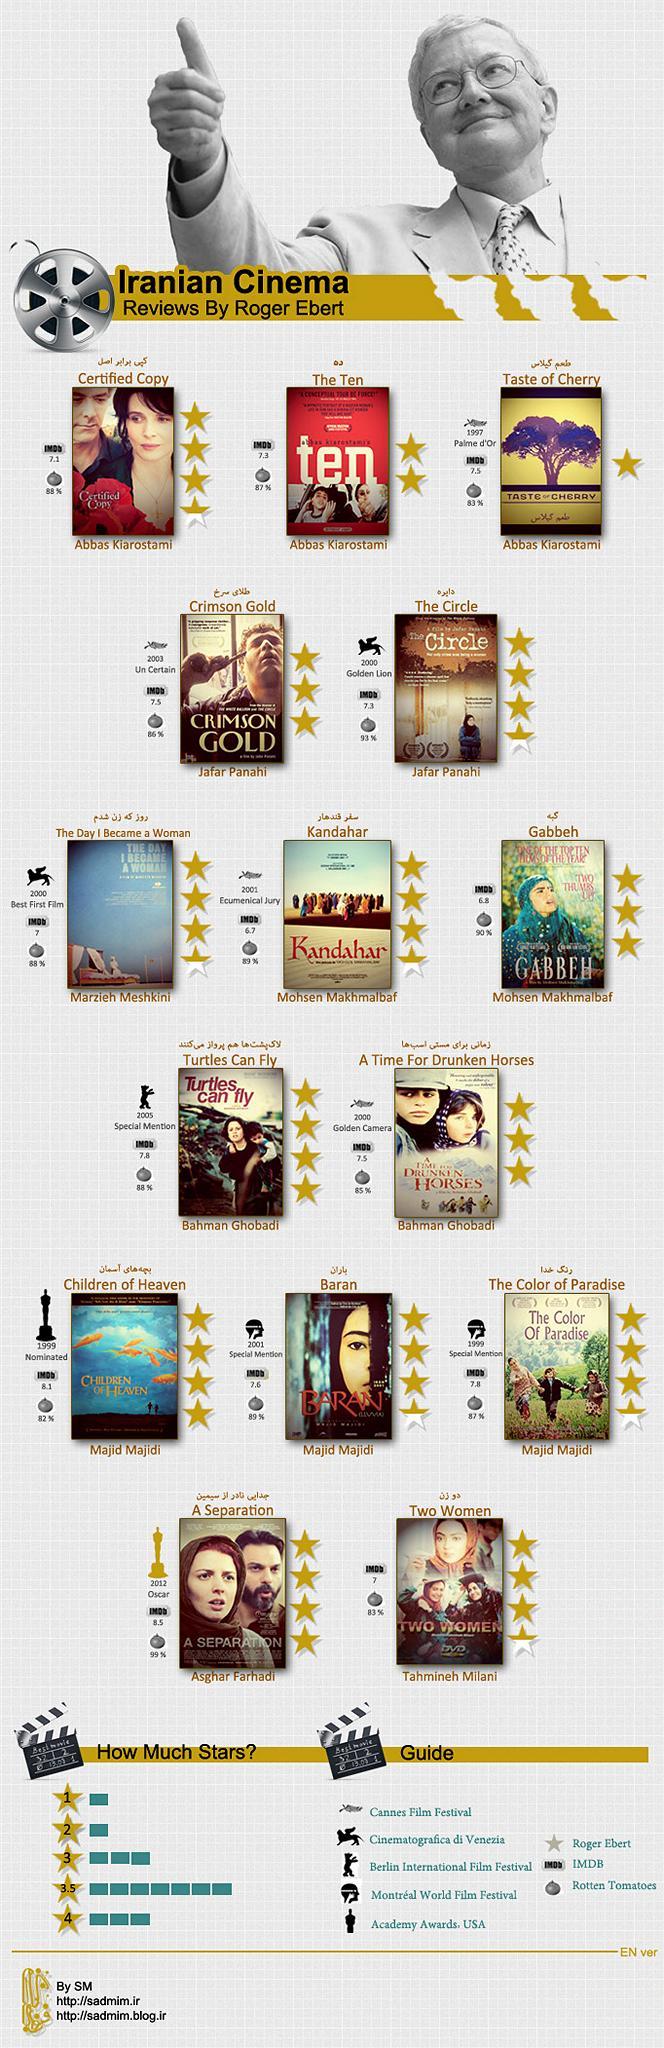 iranian-cinema-reviews-by-roger-eberten-ver_5235b5a8c3582